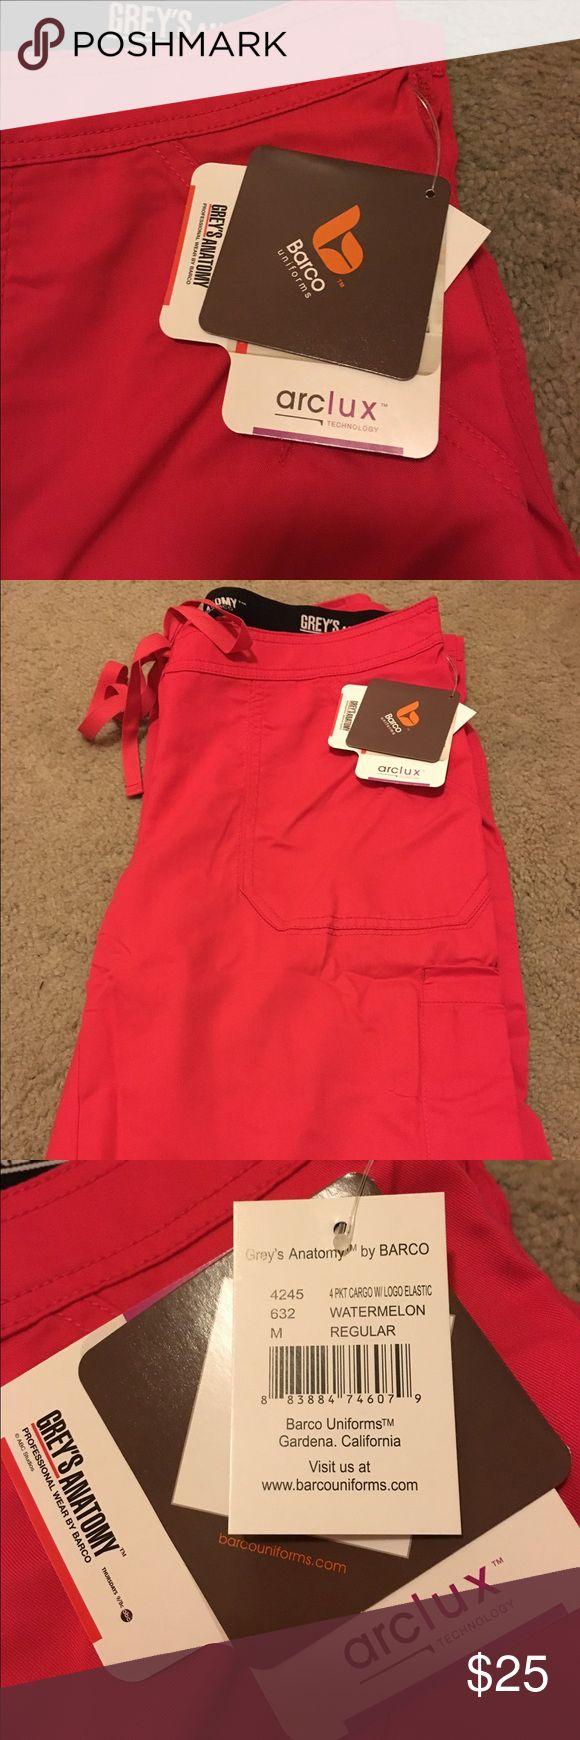 Barco: Grey's Anatomy 4 pocket cargo scrub pants Barco: Grey's Anatomy 4 pocket cargo scrub pants. Color: Watermelon. Size: Medium. NEVER BEEN WORN. Grey's Anatomy by Barco Pants